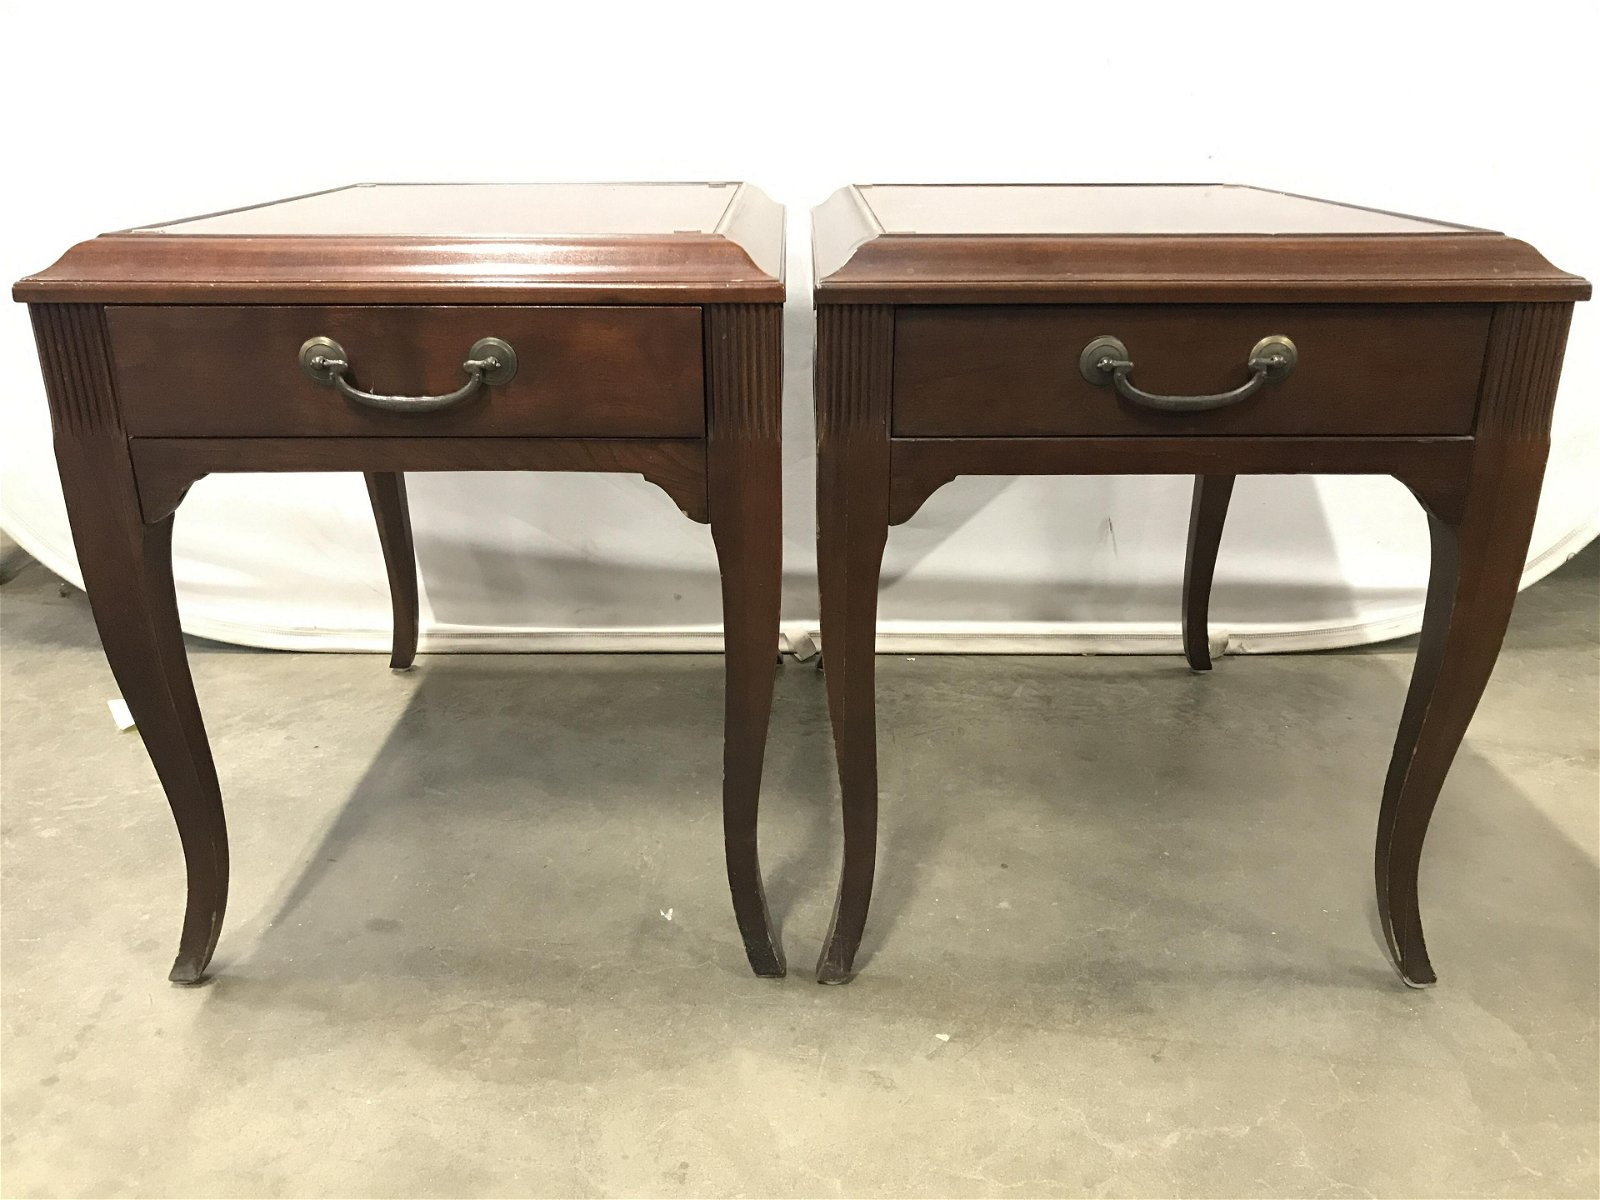 Pair Vintage ETHAN ALLEN Carved Wooden Side Tables